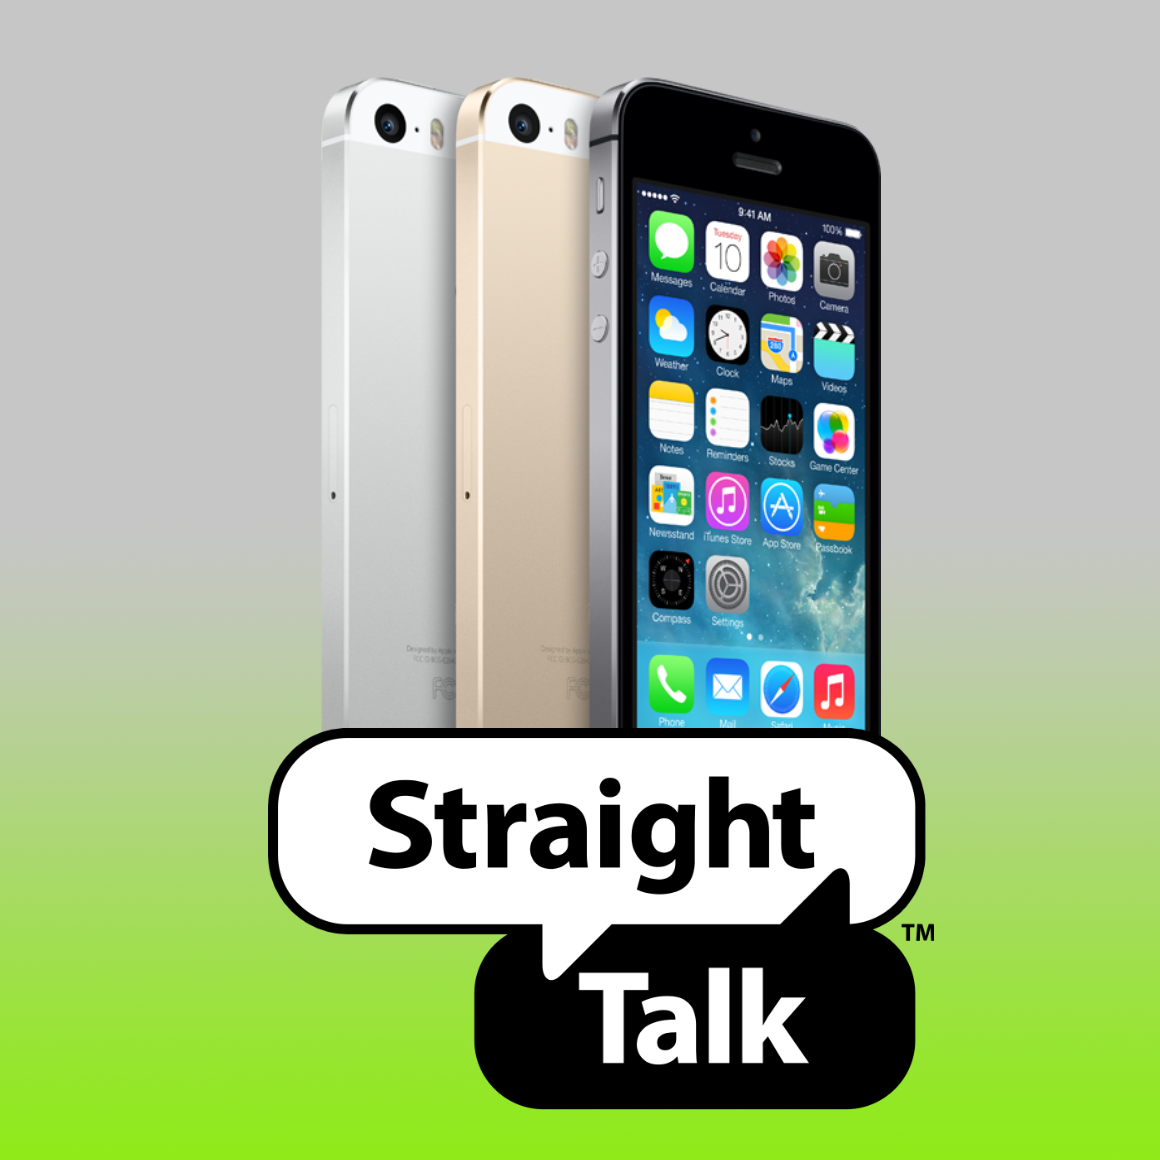 Straight talk phones are unlocked